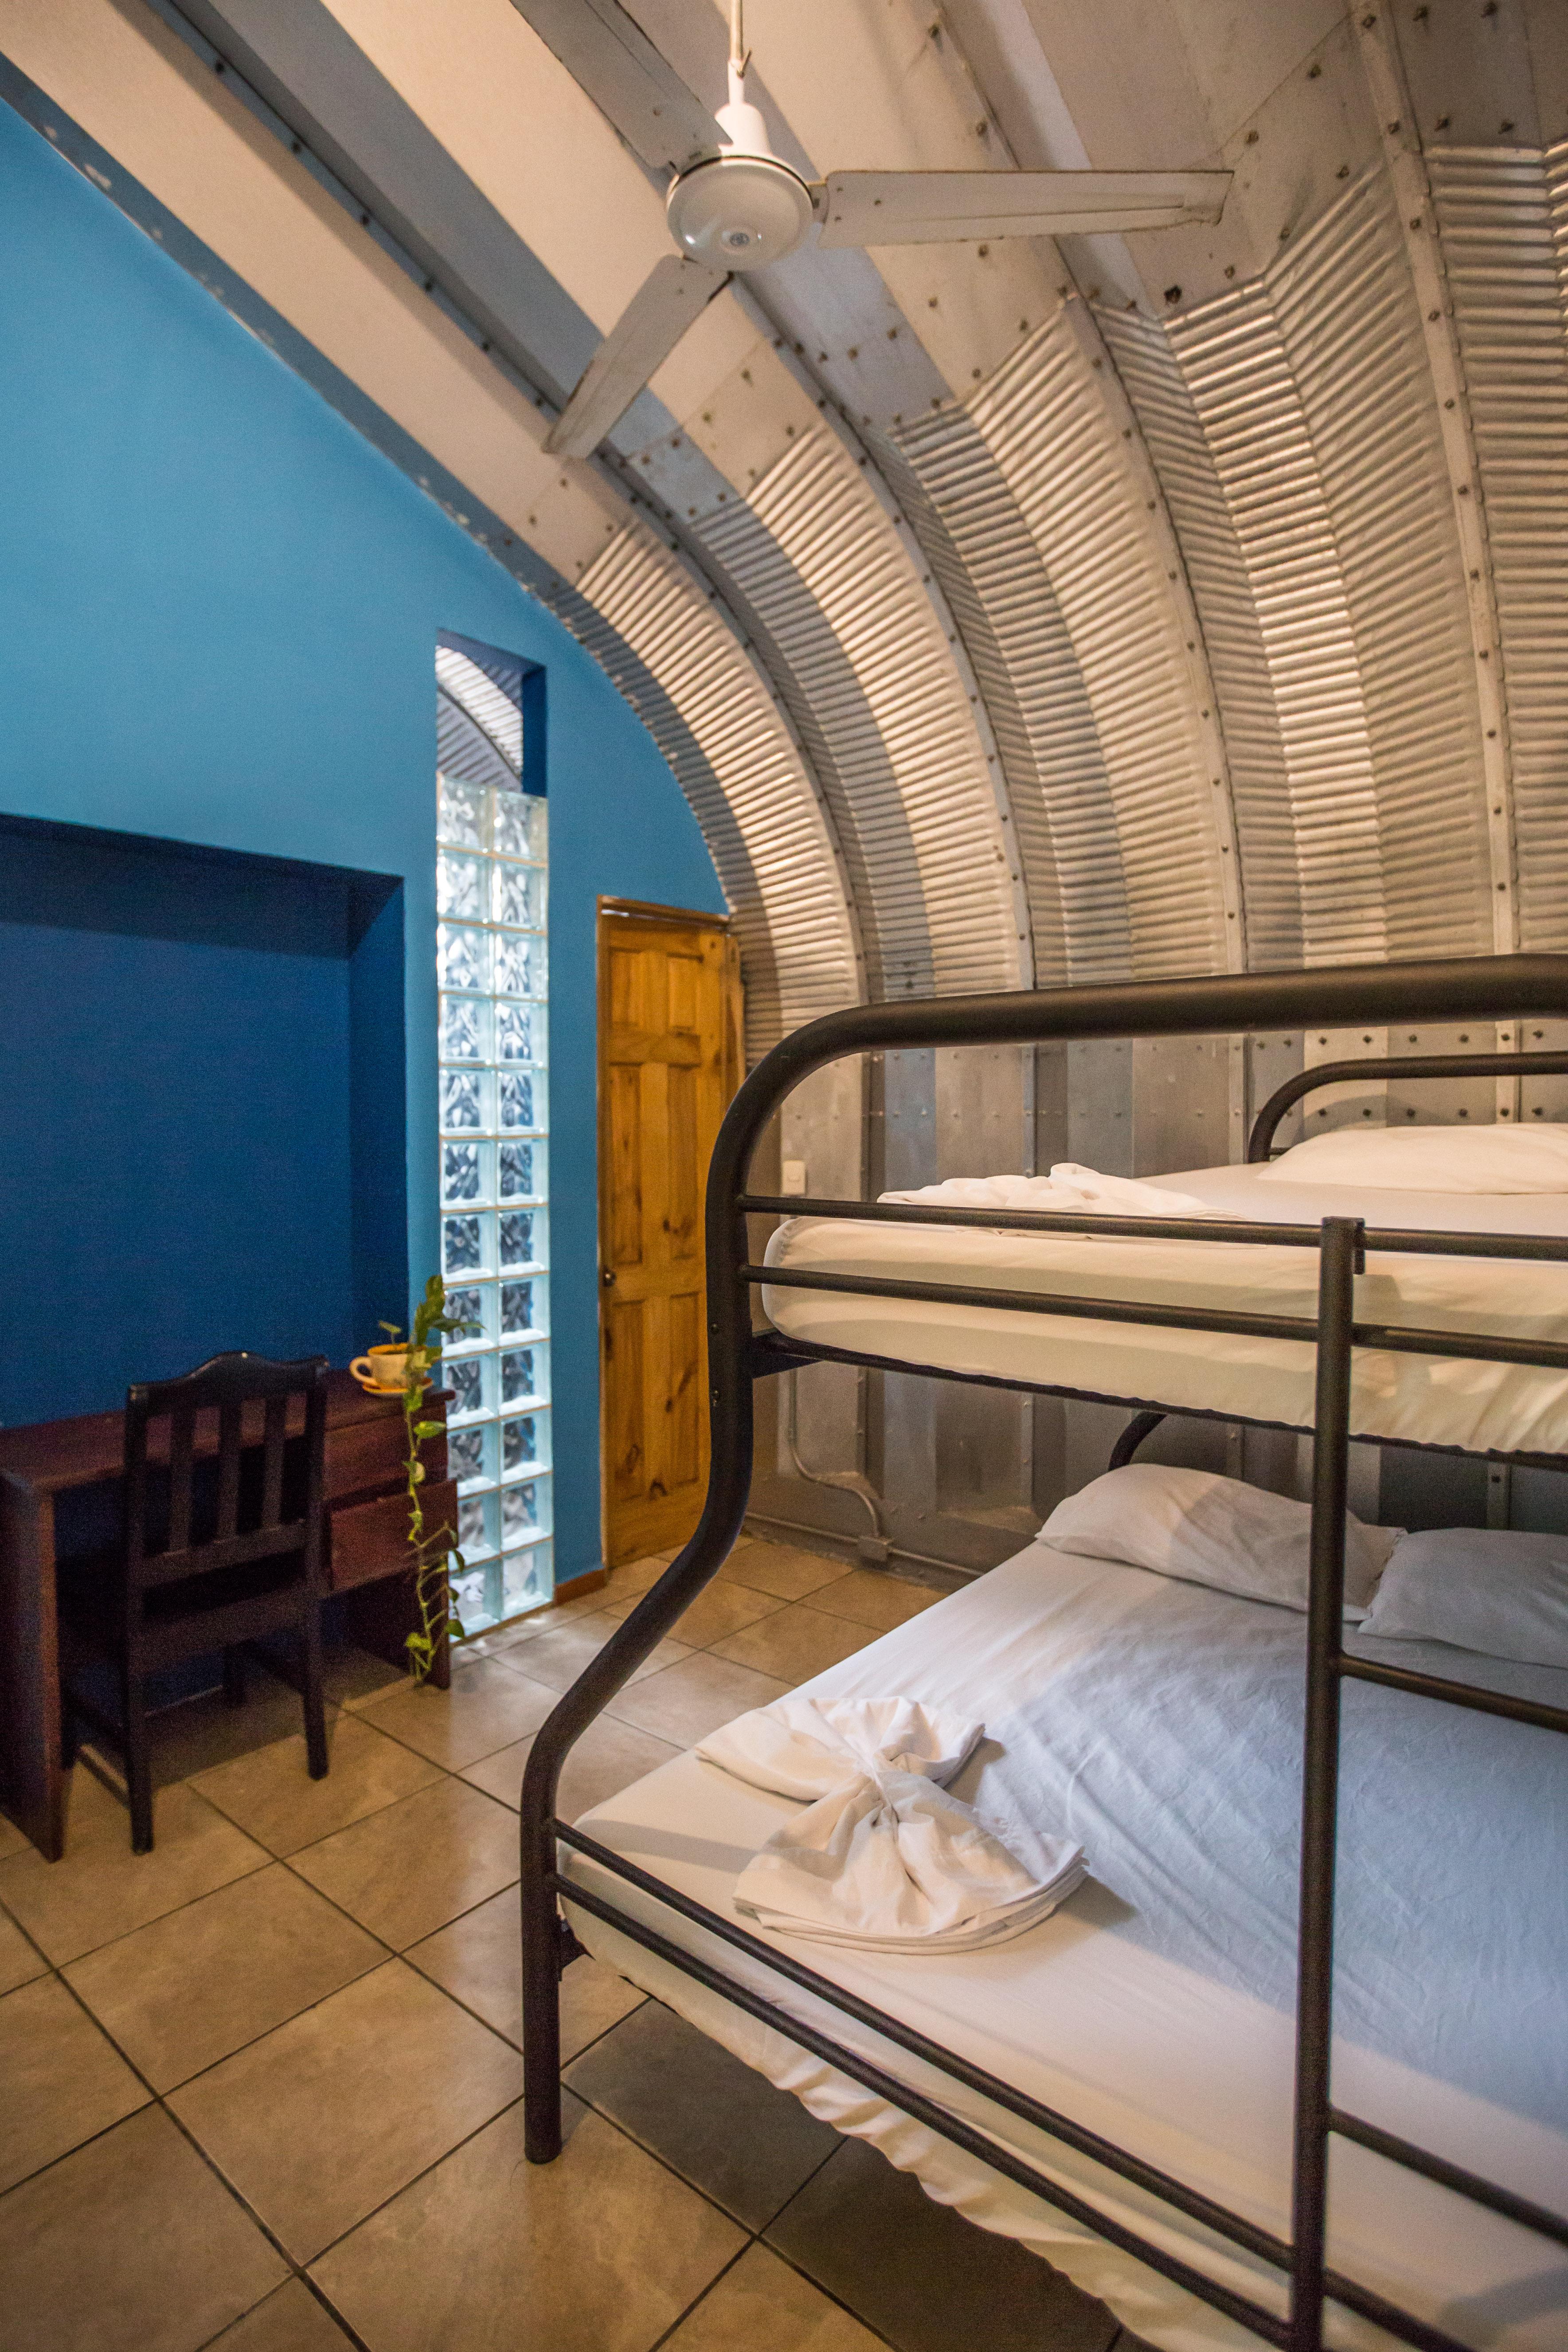 JacoInn Hostel